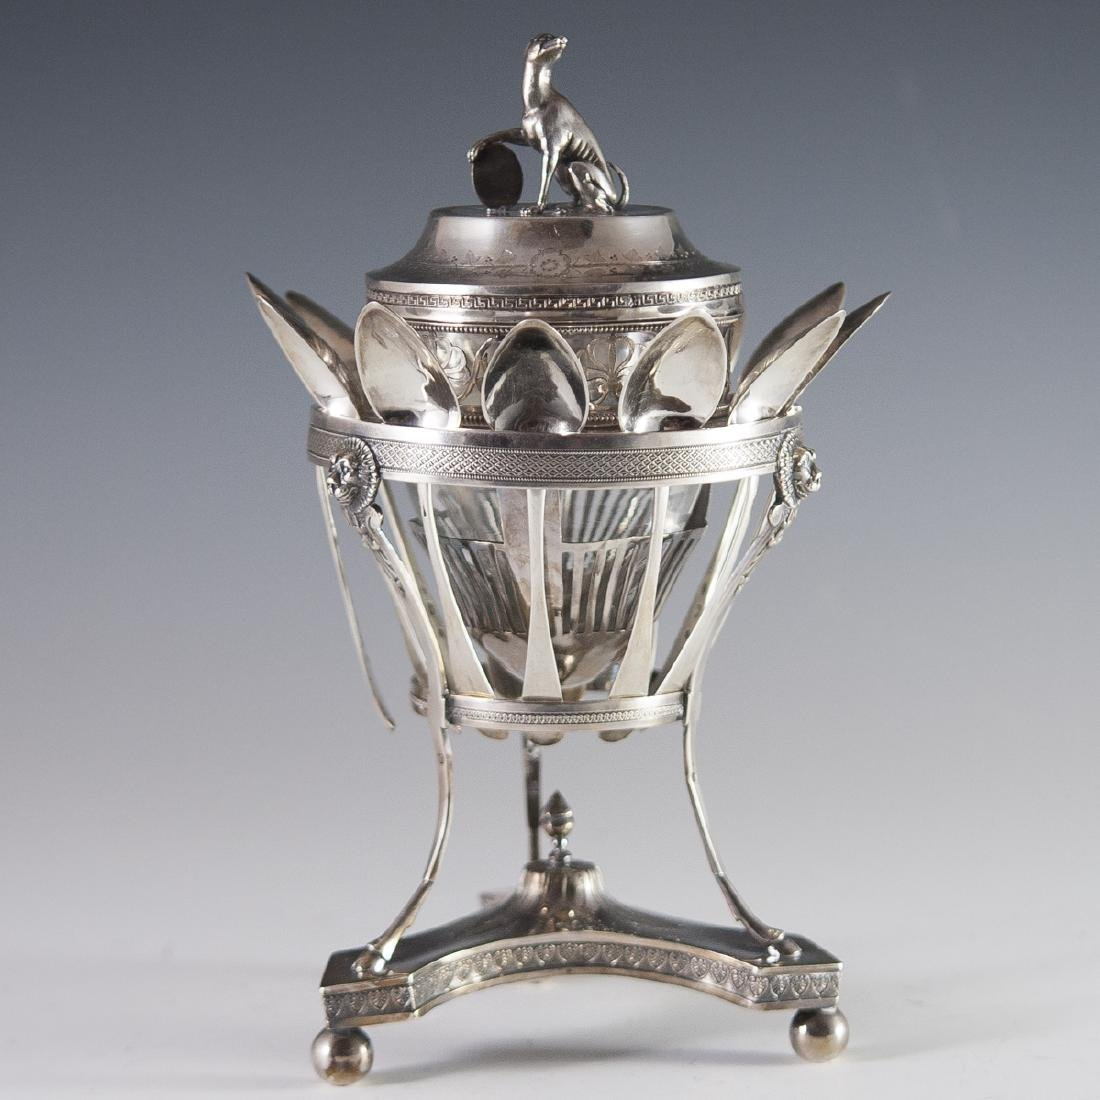 Antique Pierre Phillippe Rosseau Sterling Confiture Jar